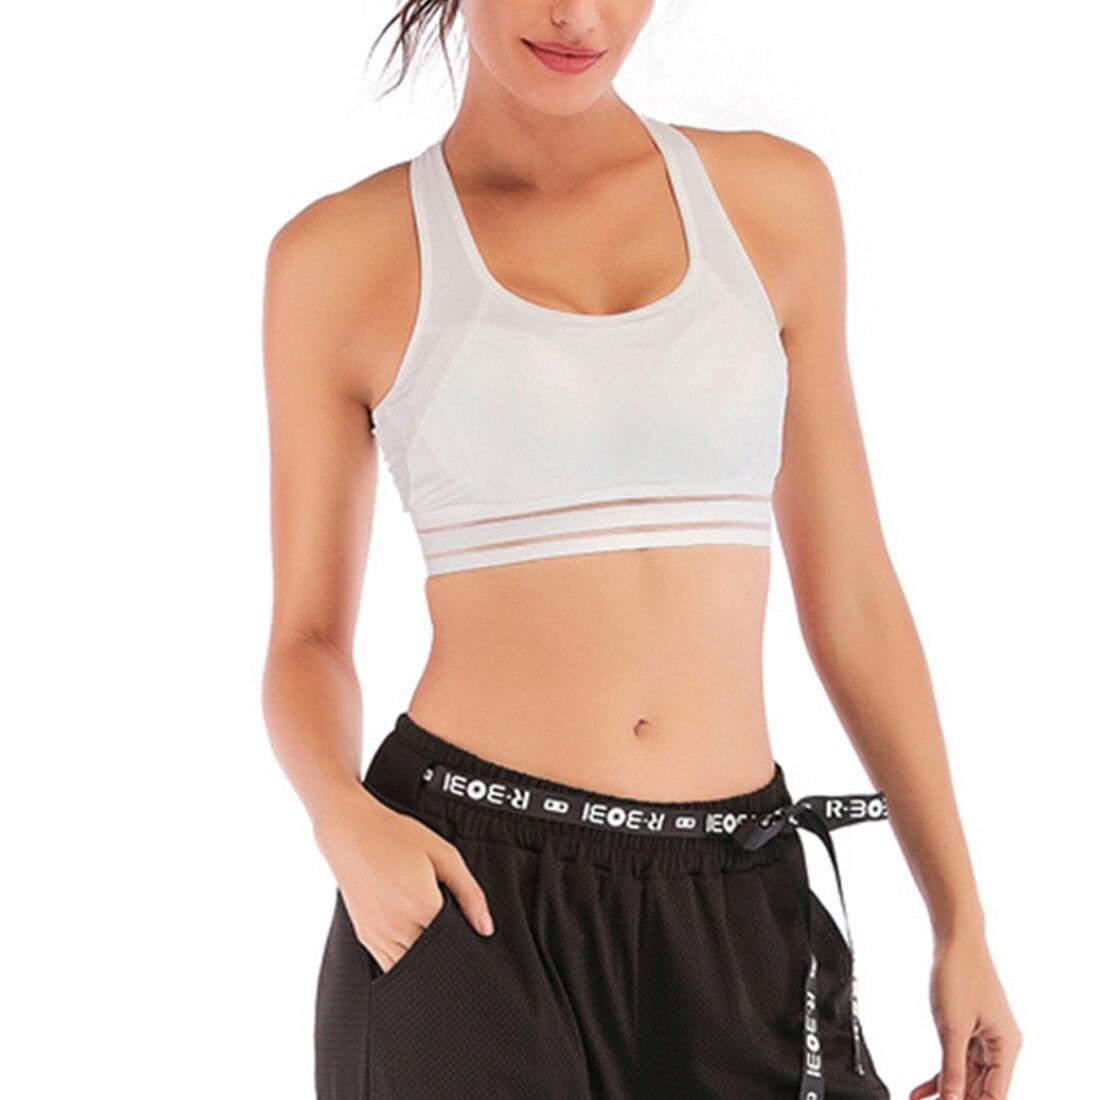 Women Yoga Sports Bra Fitness Padded Gym Cross Back Anti Impact Workout Running Non Wired